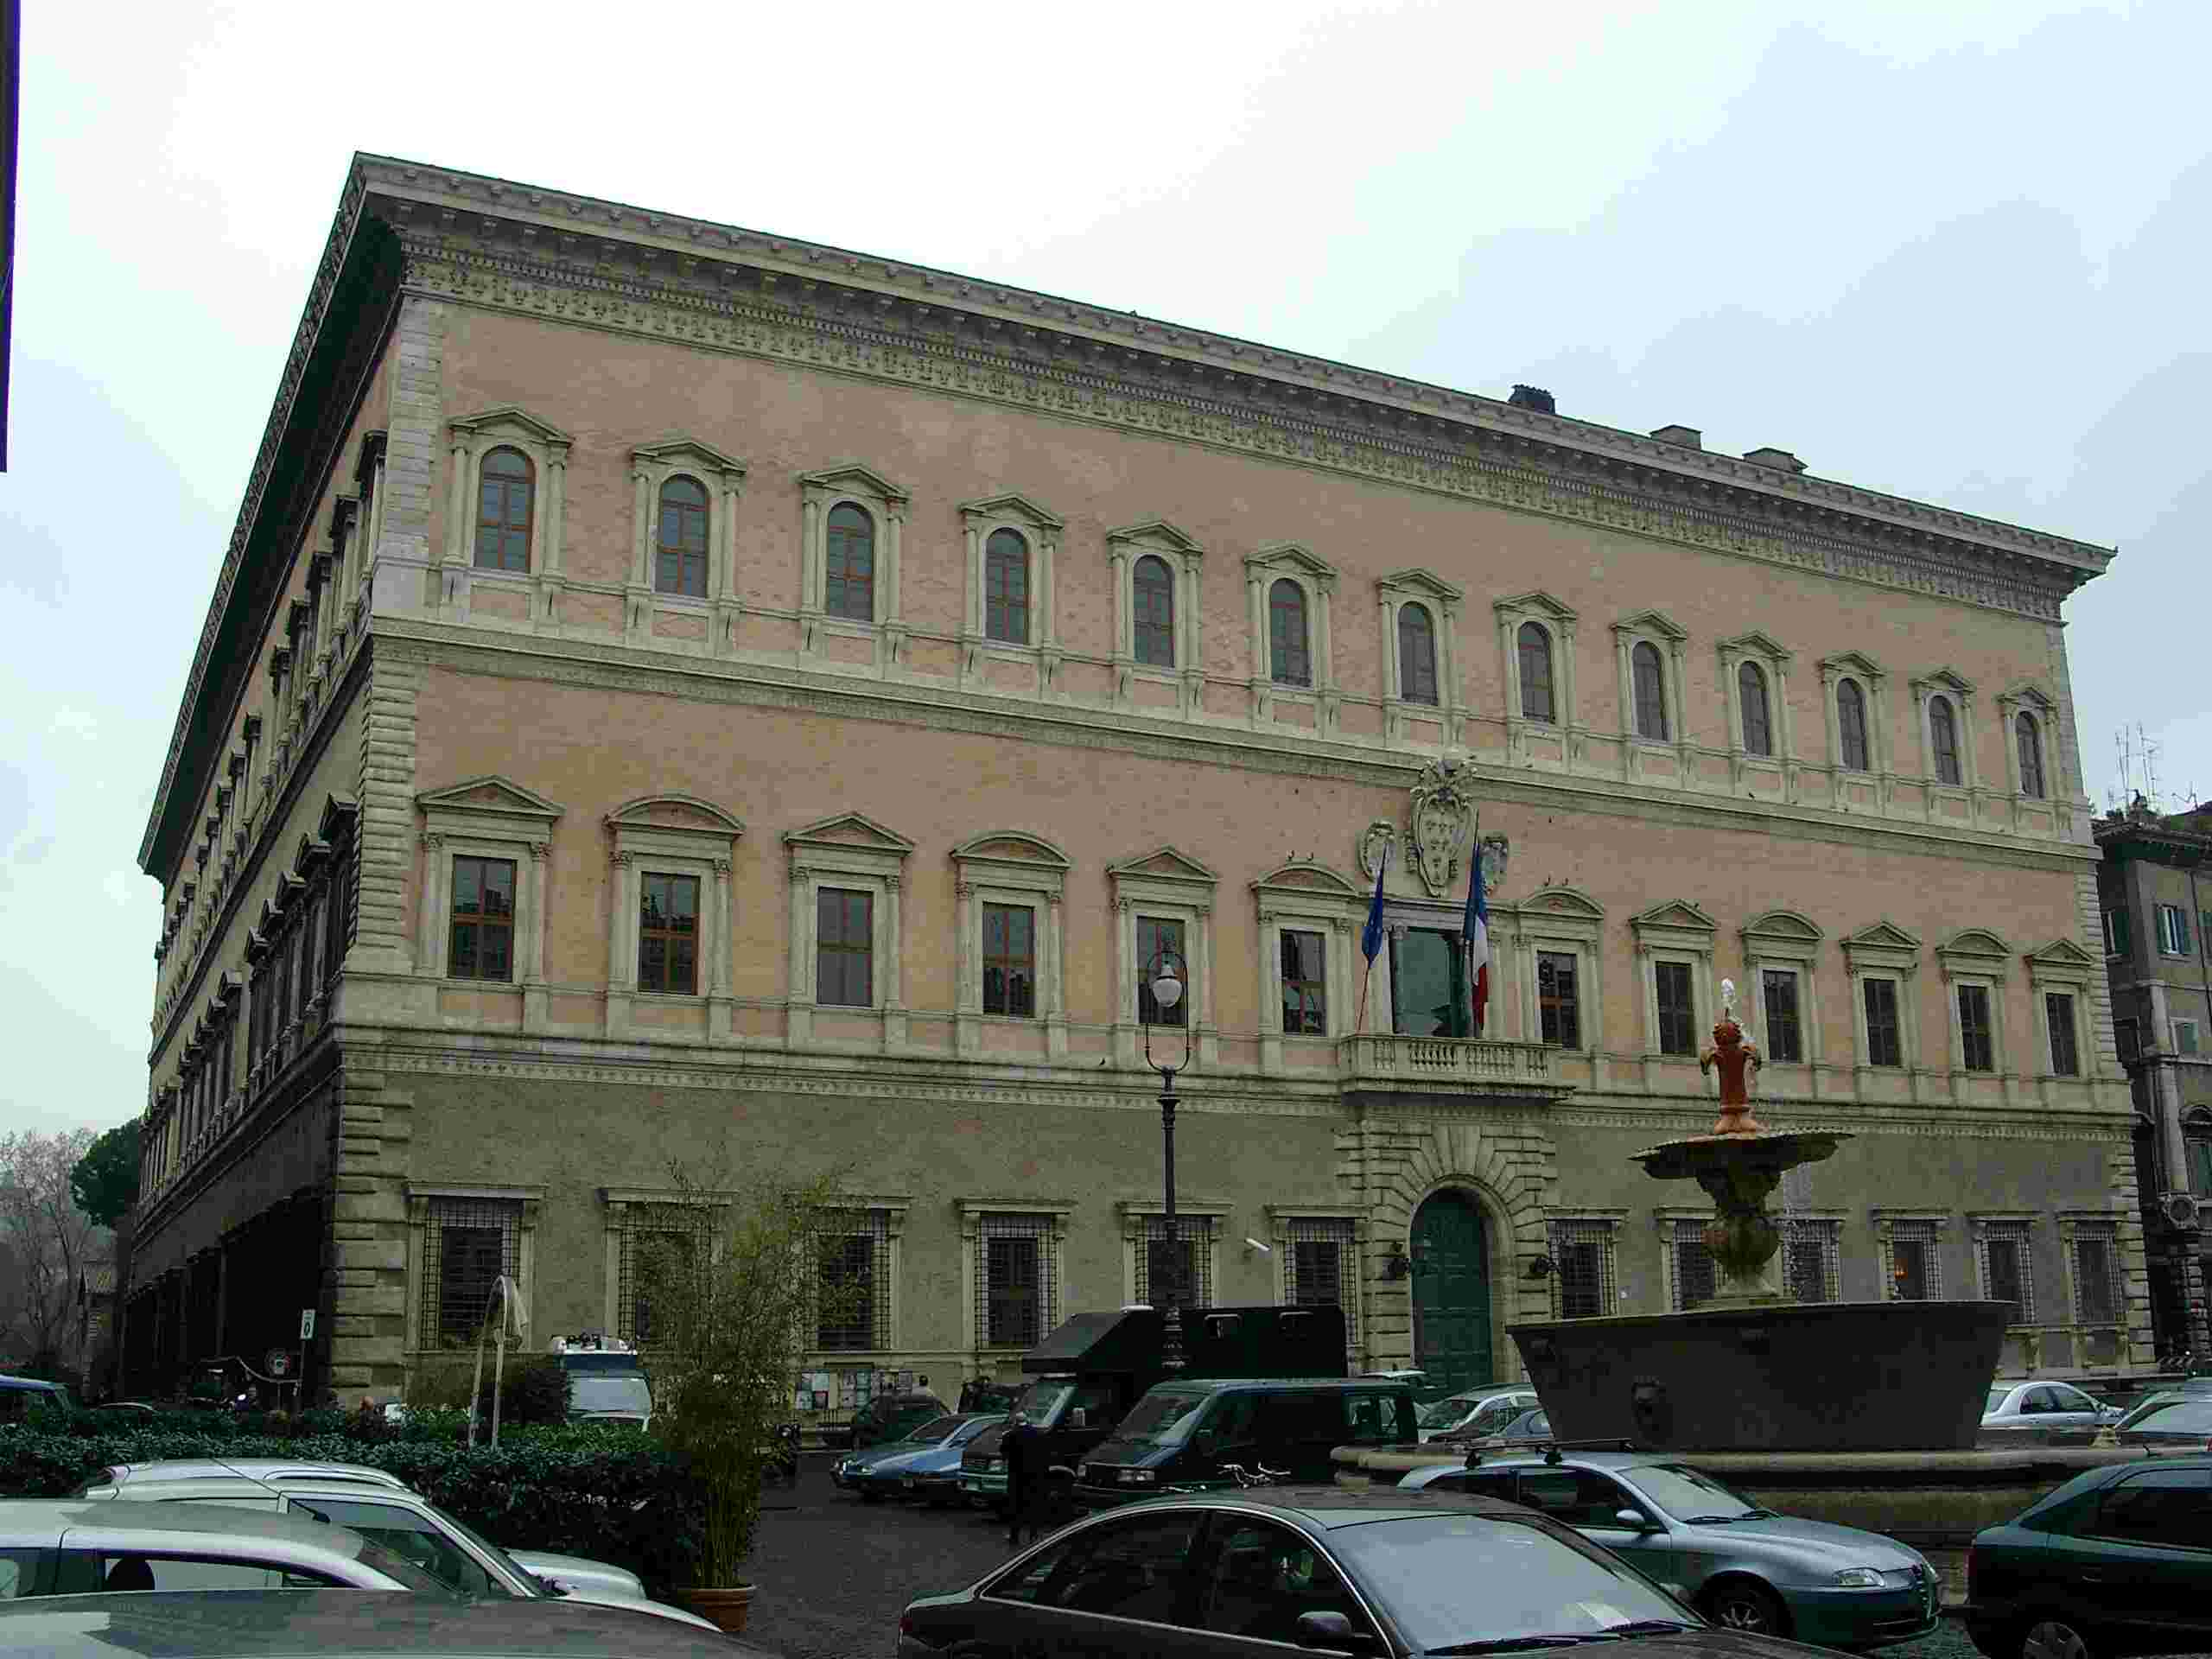 palazzo farnese - photo #12